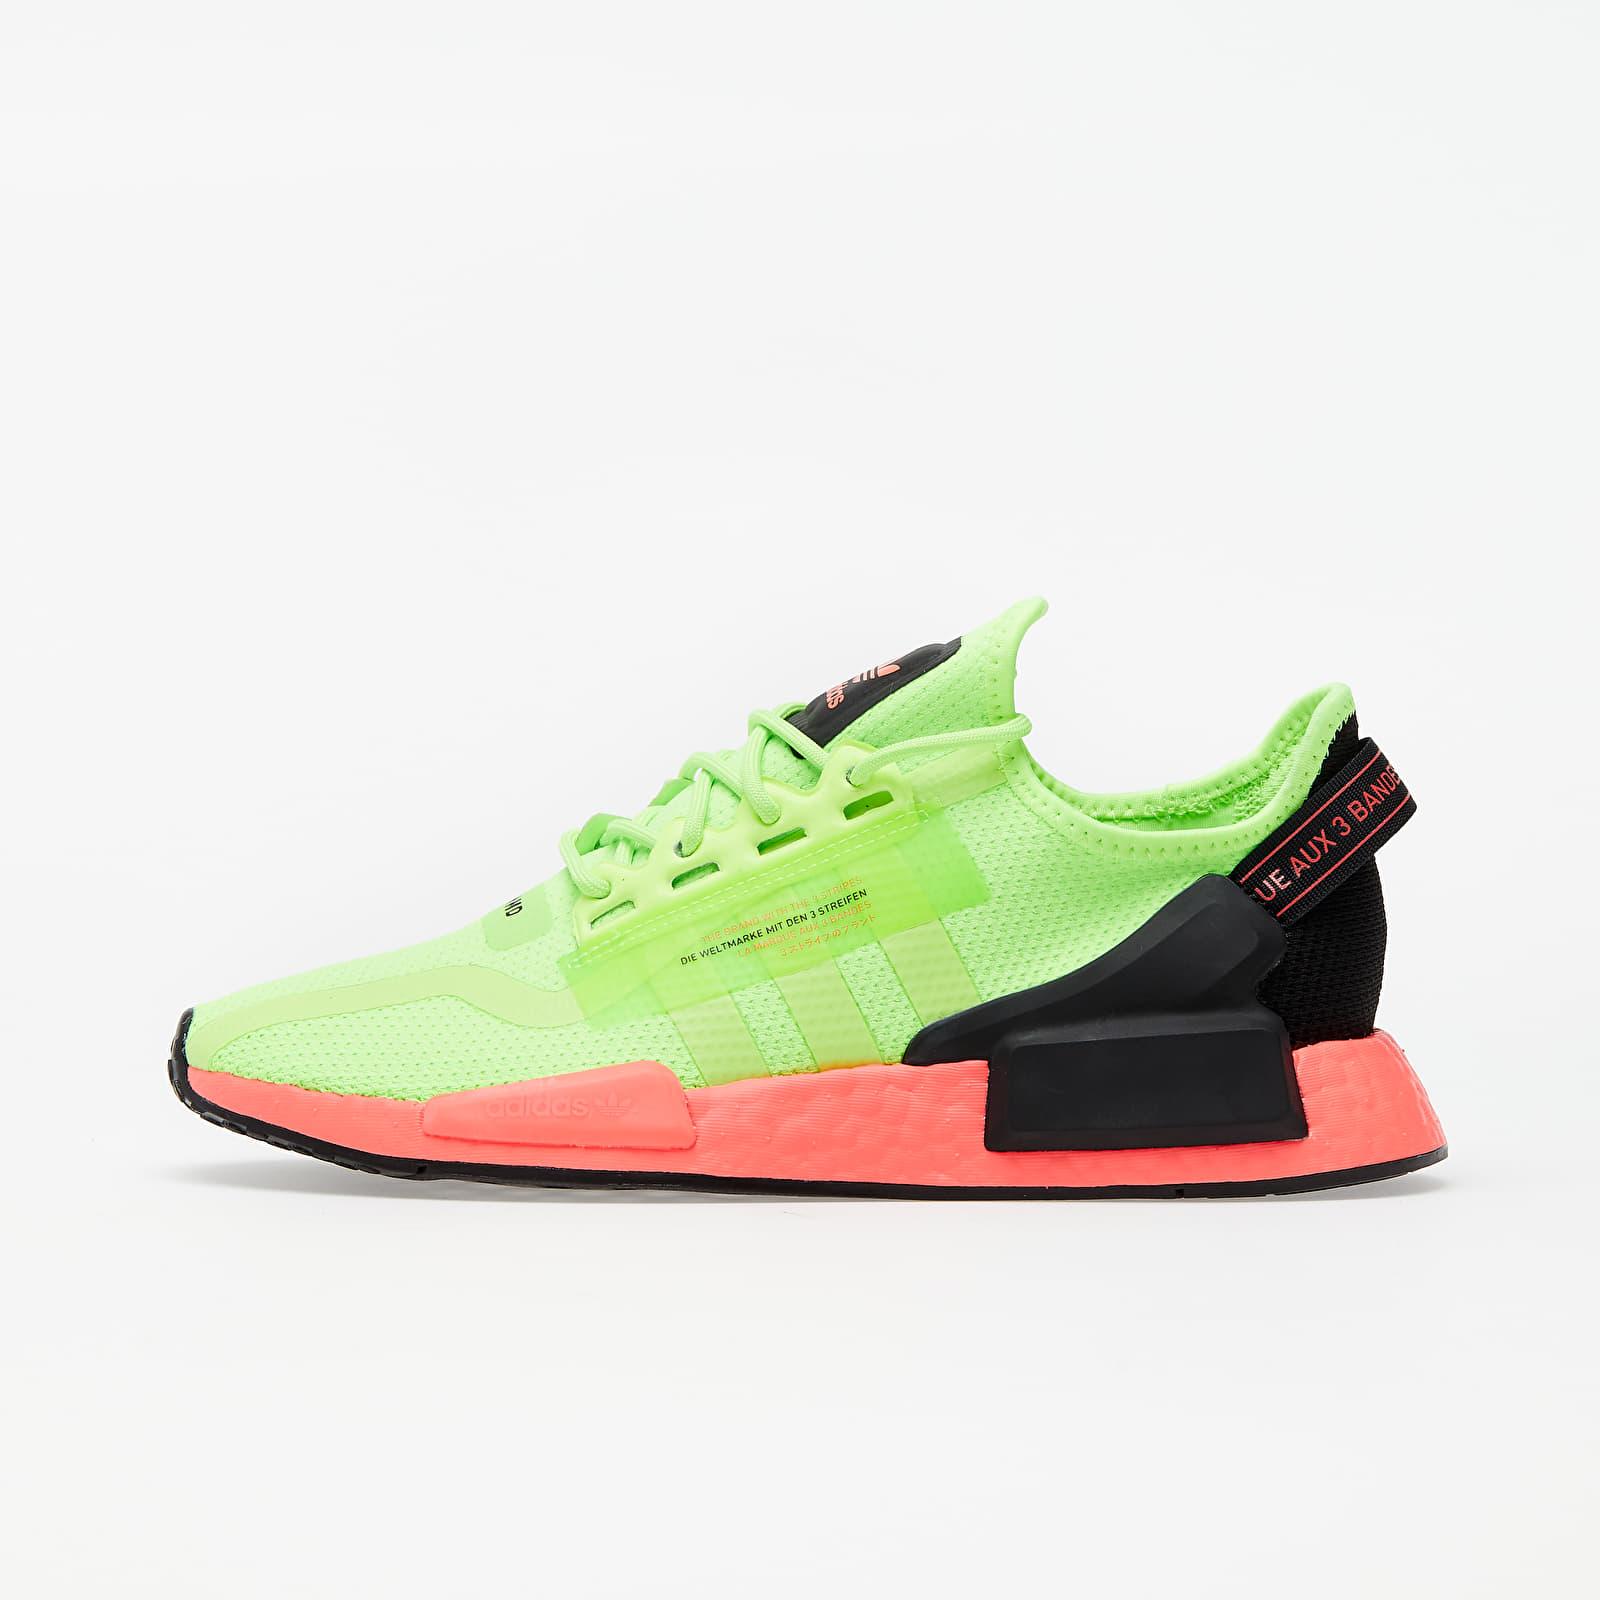 adidas NMD_R1.V2 Signature Green/ Signature Green/ Signature Pink EUR 40